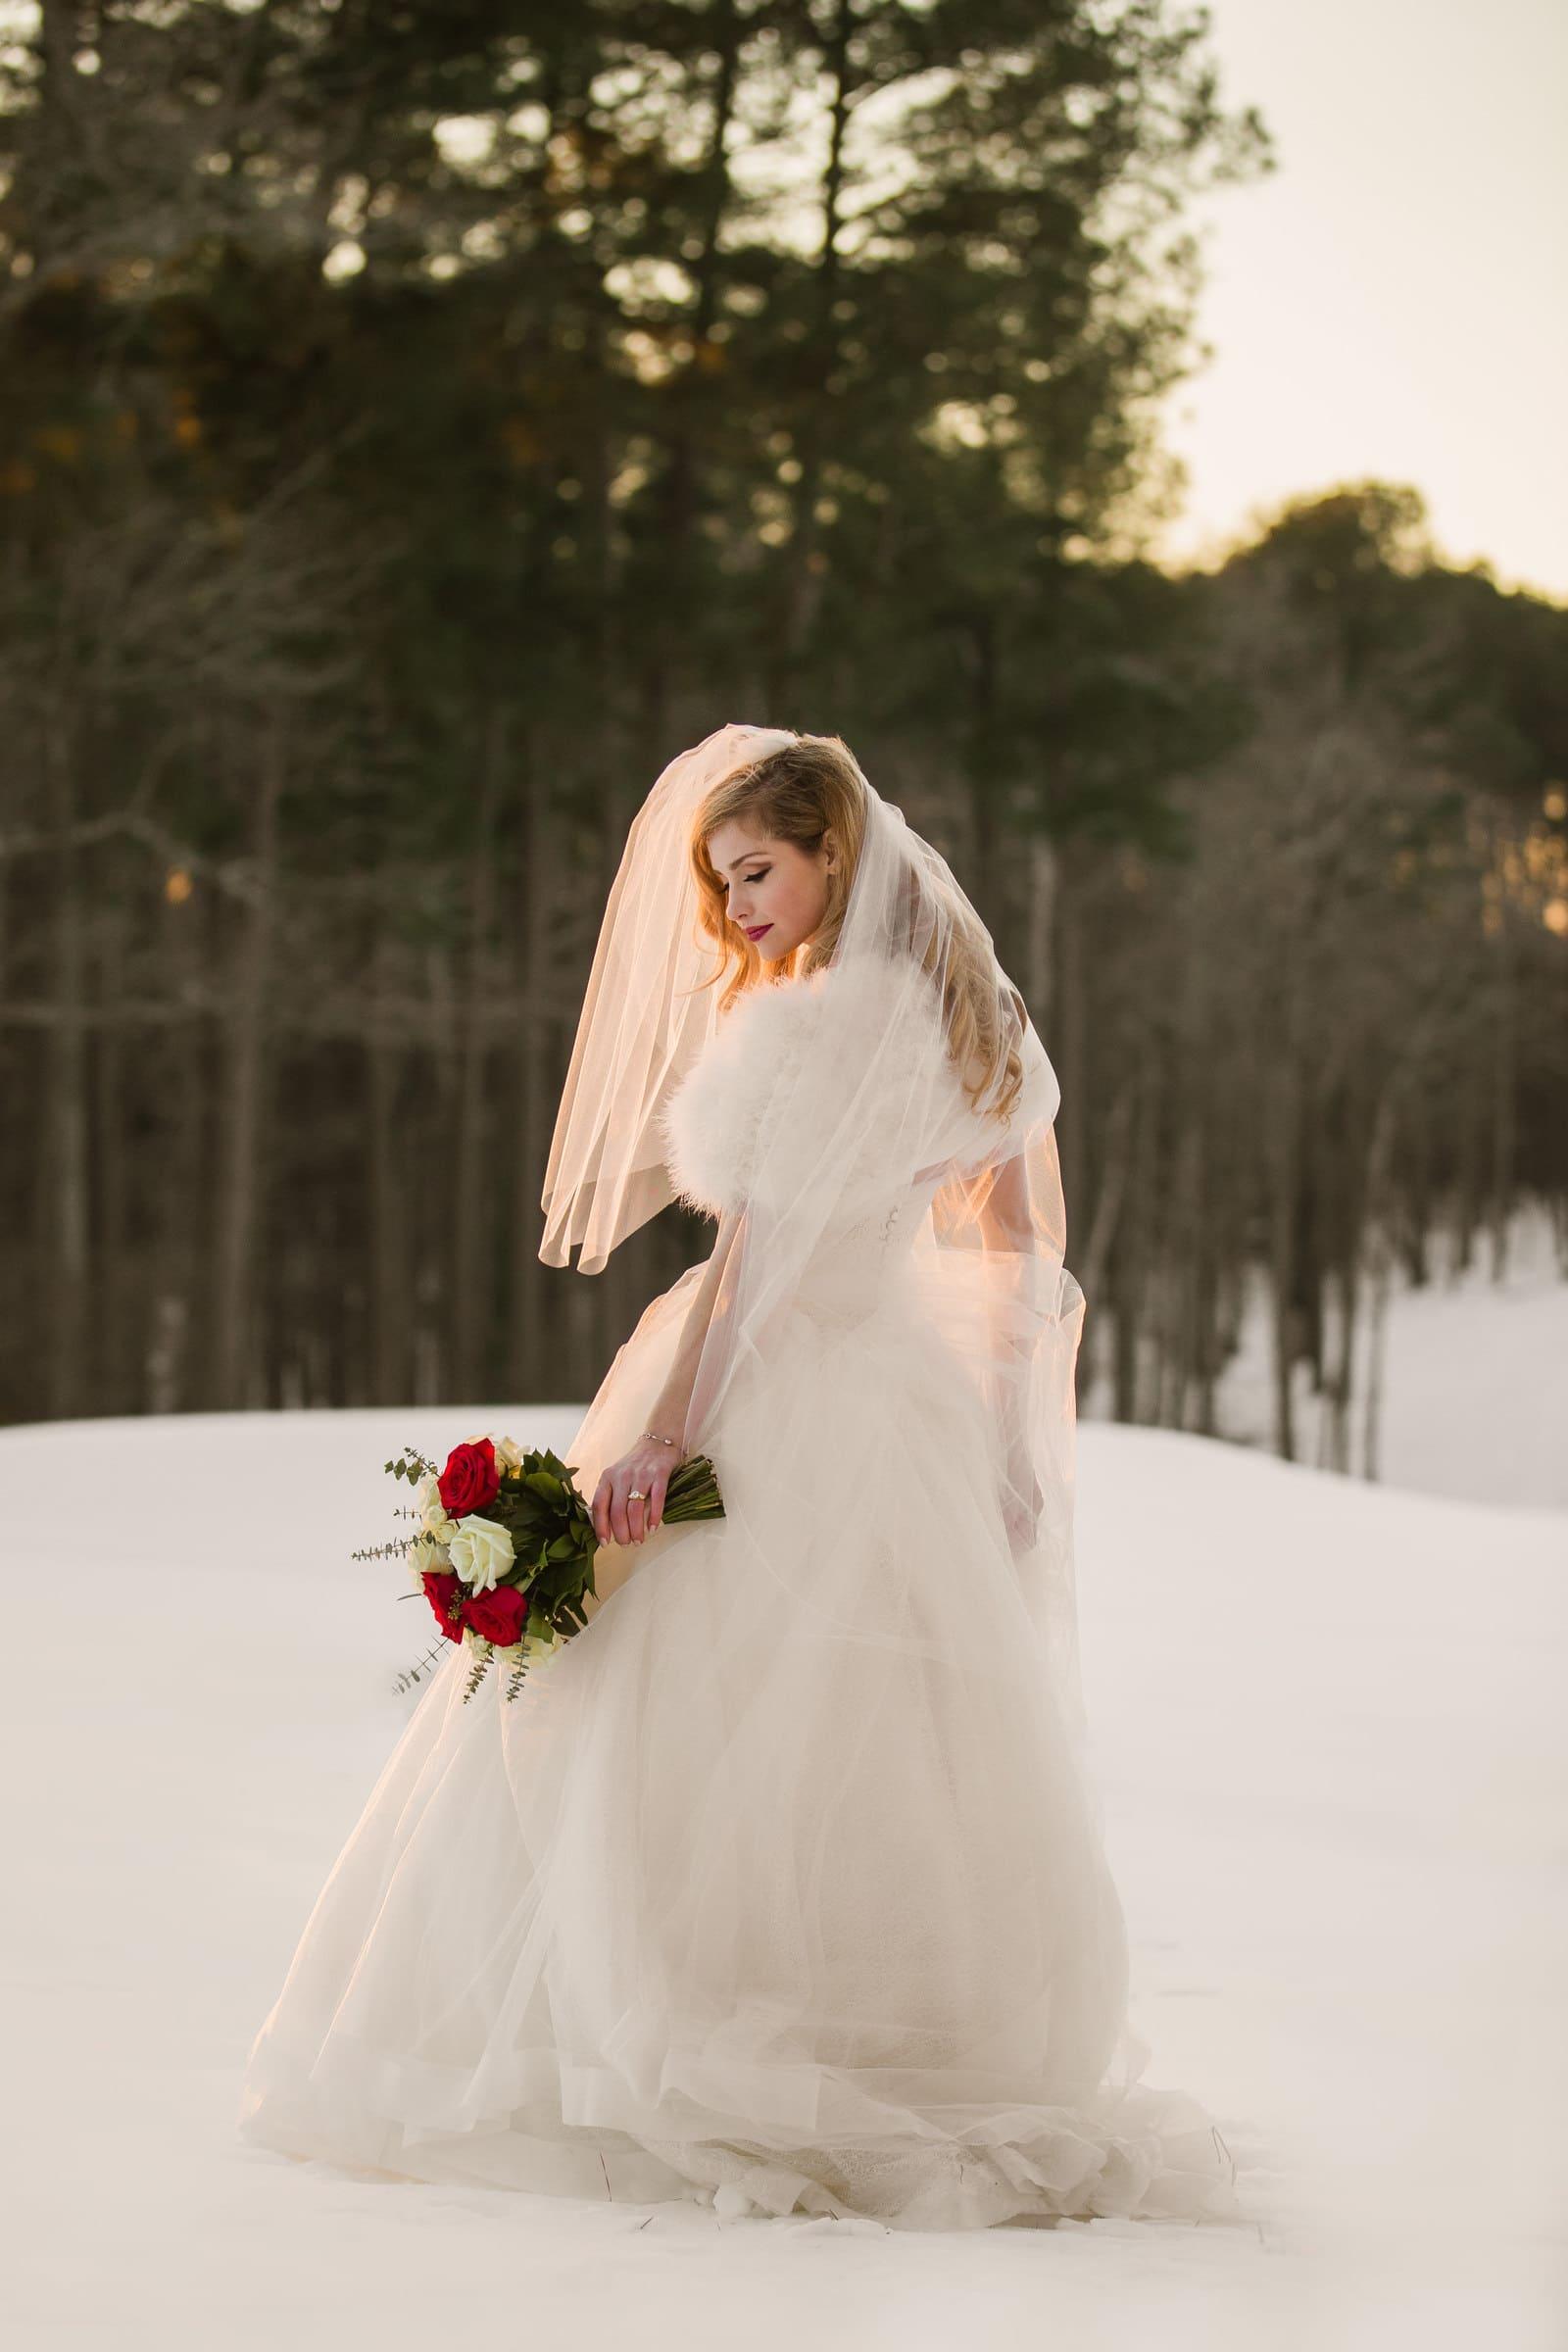 Duke Chapel Wedding Photography - Bridal Portrait in Snow by Joe Payne